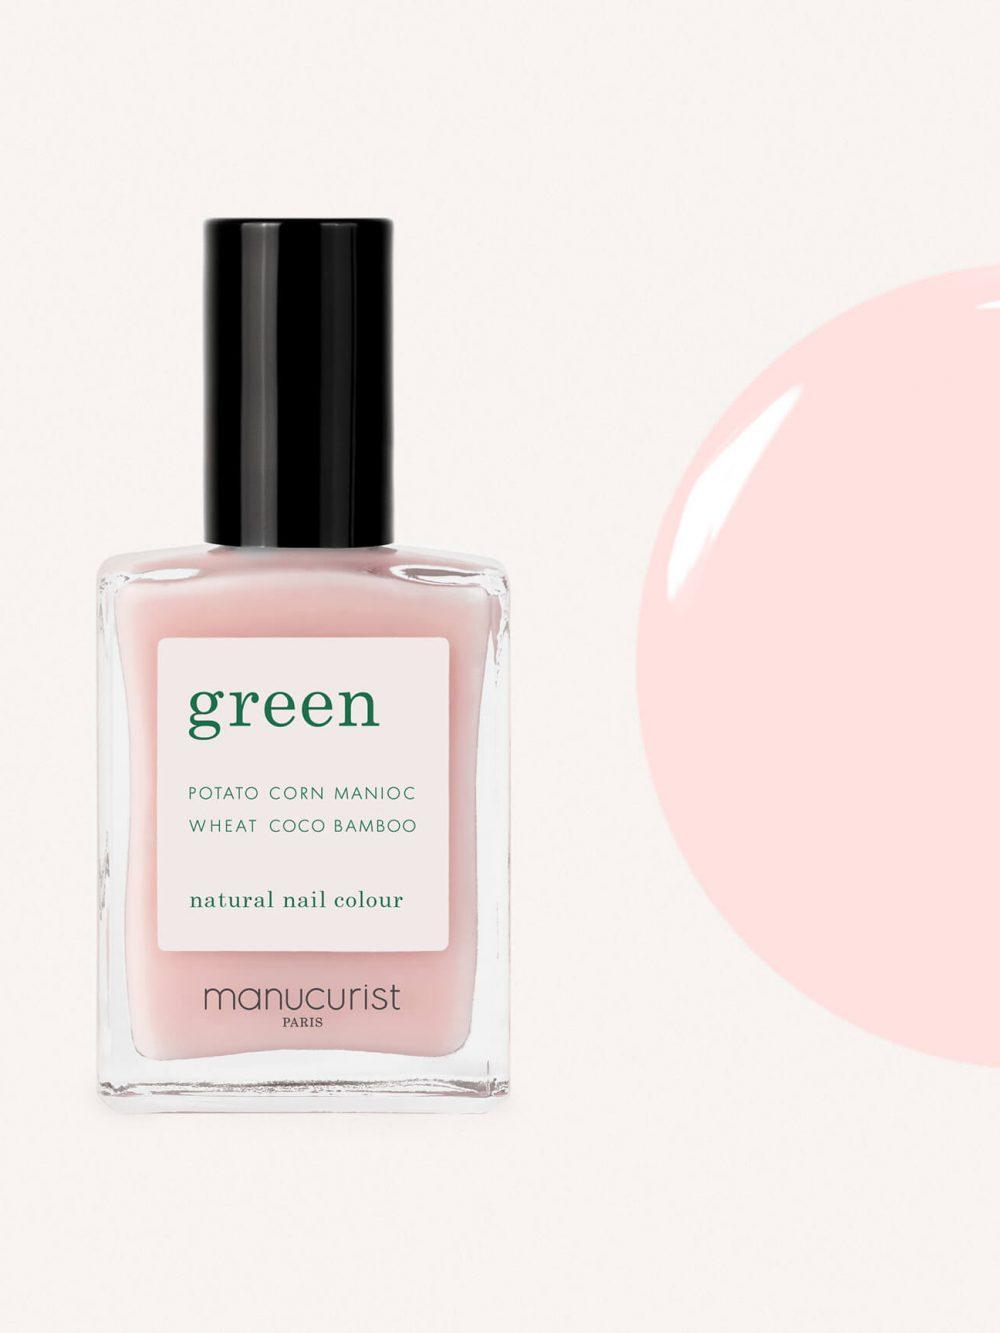 vernis à ongles bio green de la marque Manucurist made in france de couleur nude rose hortensia